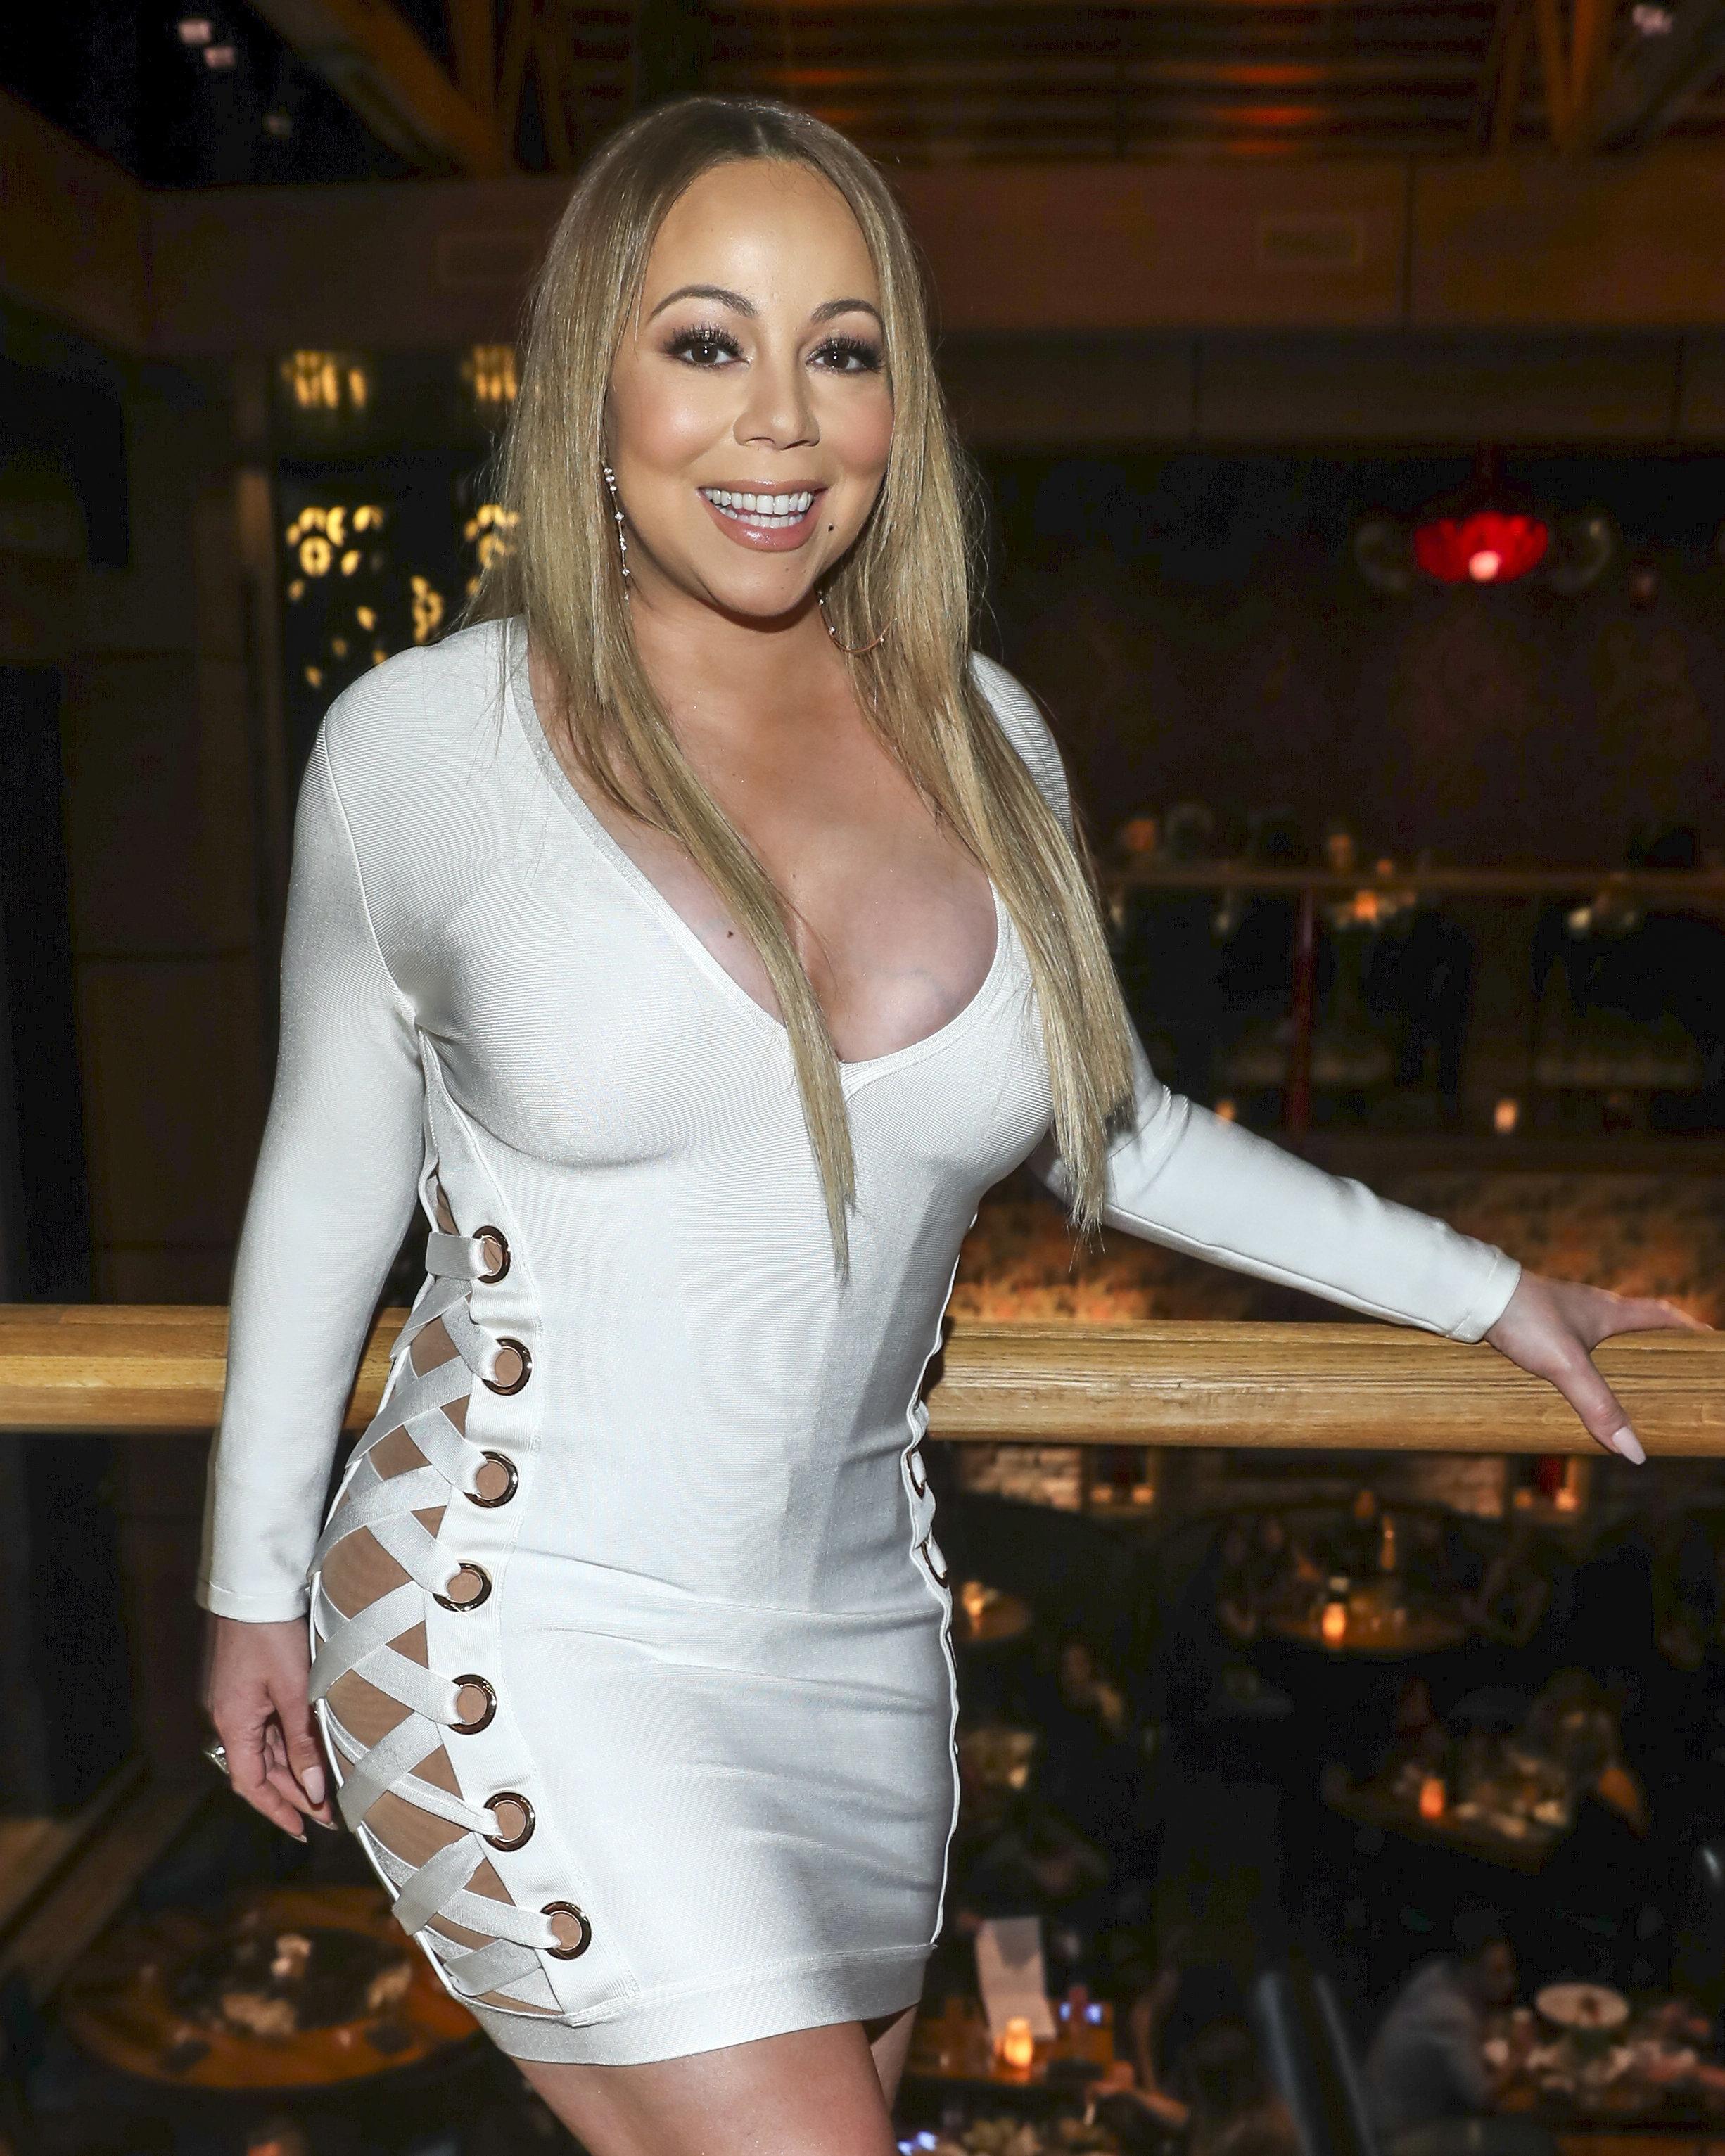 'X Factor' Bosses 'Lining Up Mariah Carey' For Judging